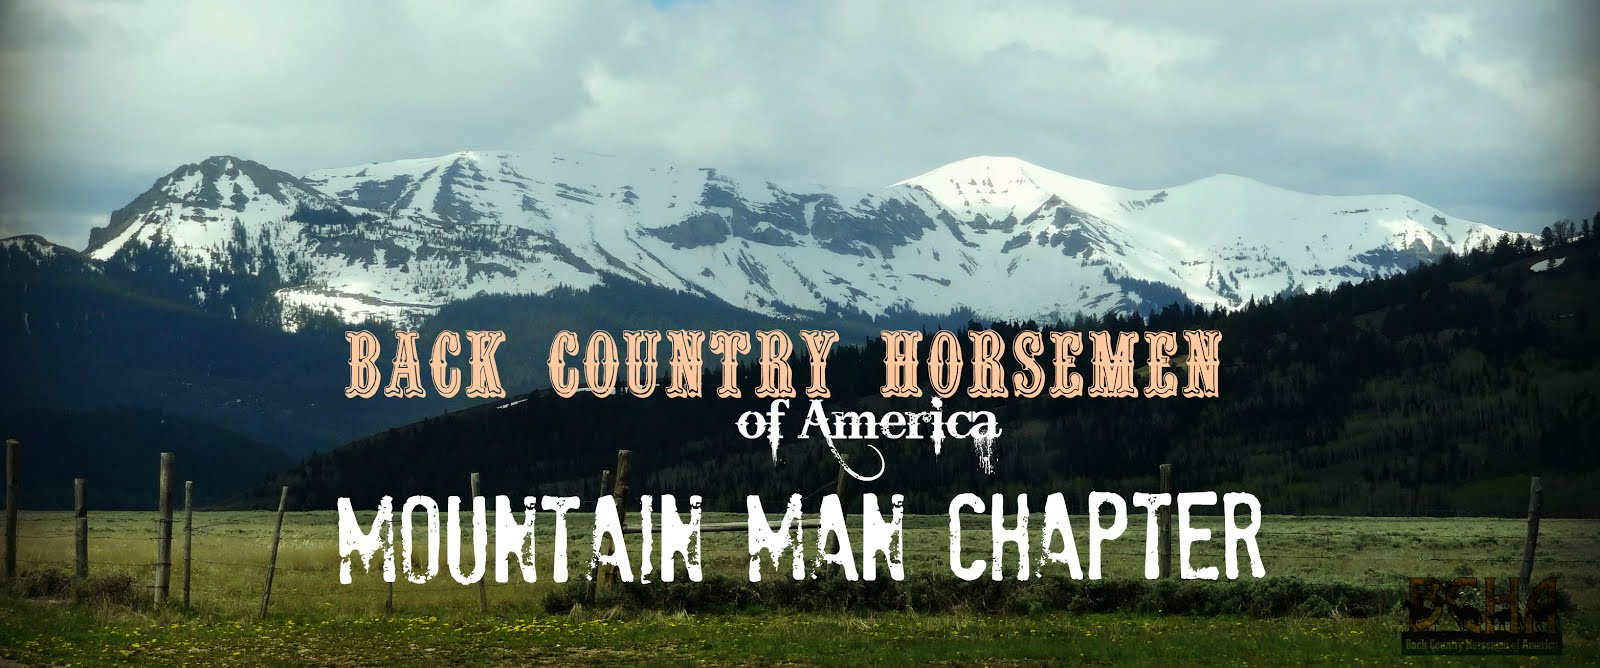 Mountain Man Chapter BCHA